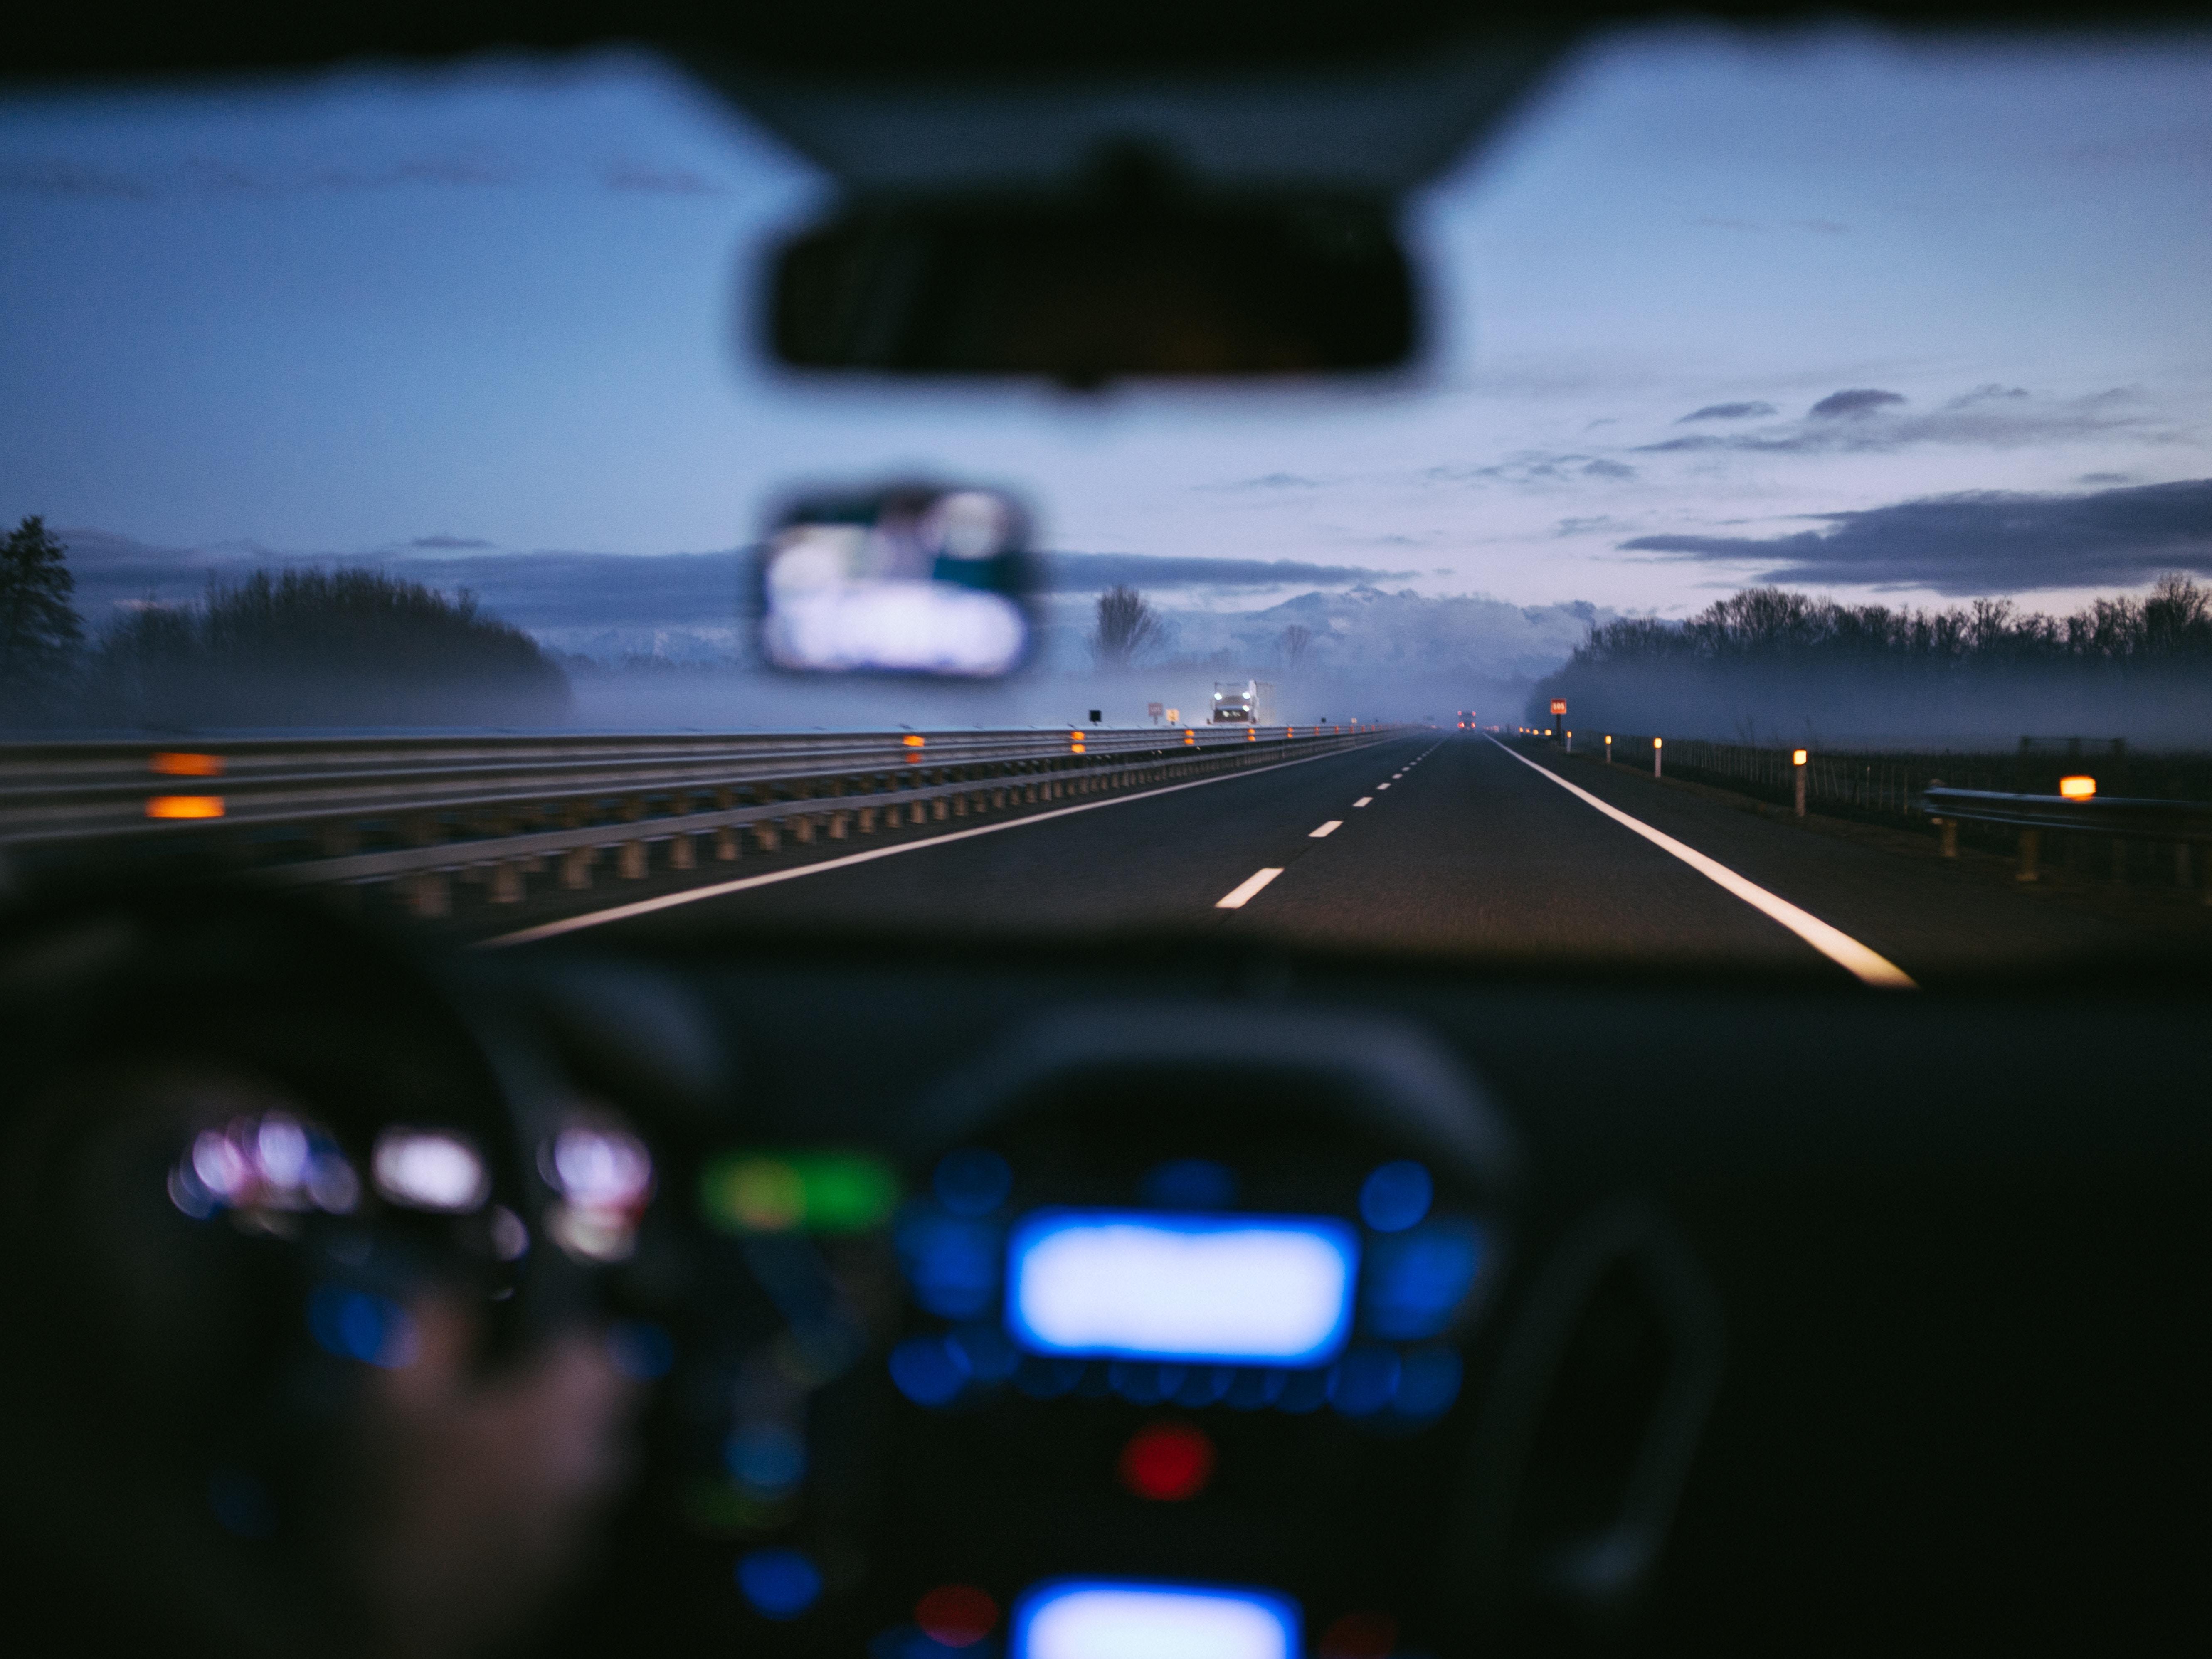 Fahrzeugtransport